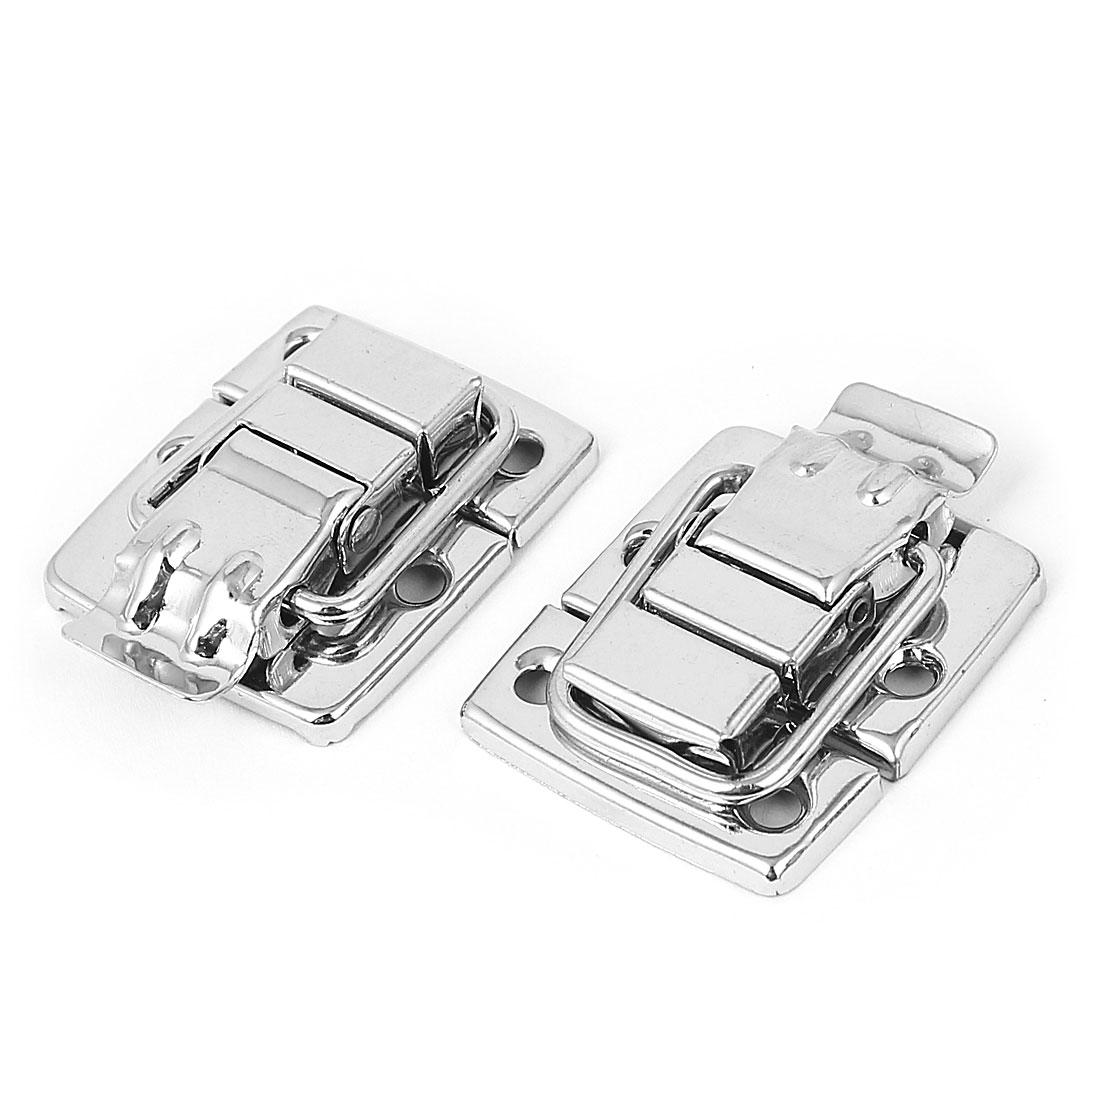 Wardrobe Box Case Metal Toggle Latch Hasp 40 x 30 x 8mm Silver Tone 2pcs